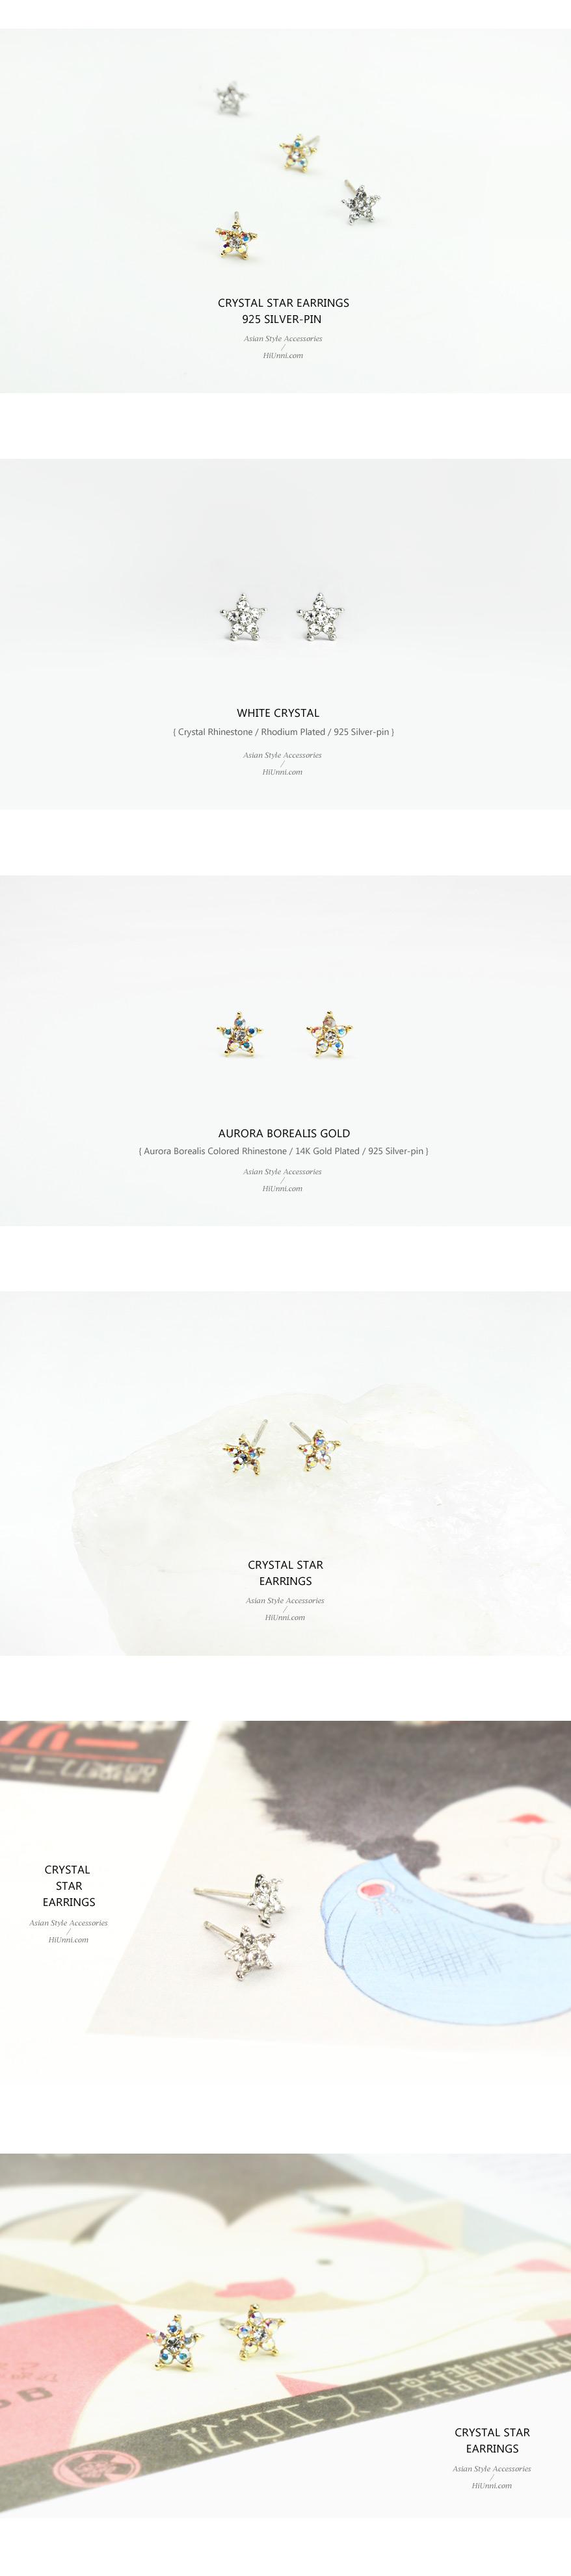 accessories_ear_stud_earrings_korean_asian-style_Crystal_Rhinestone_925-silver_Rhodium-Plated_14K-Gold-Plated_Nickel-Free_Star_1